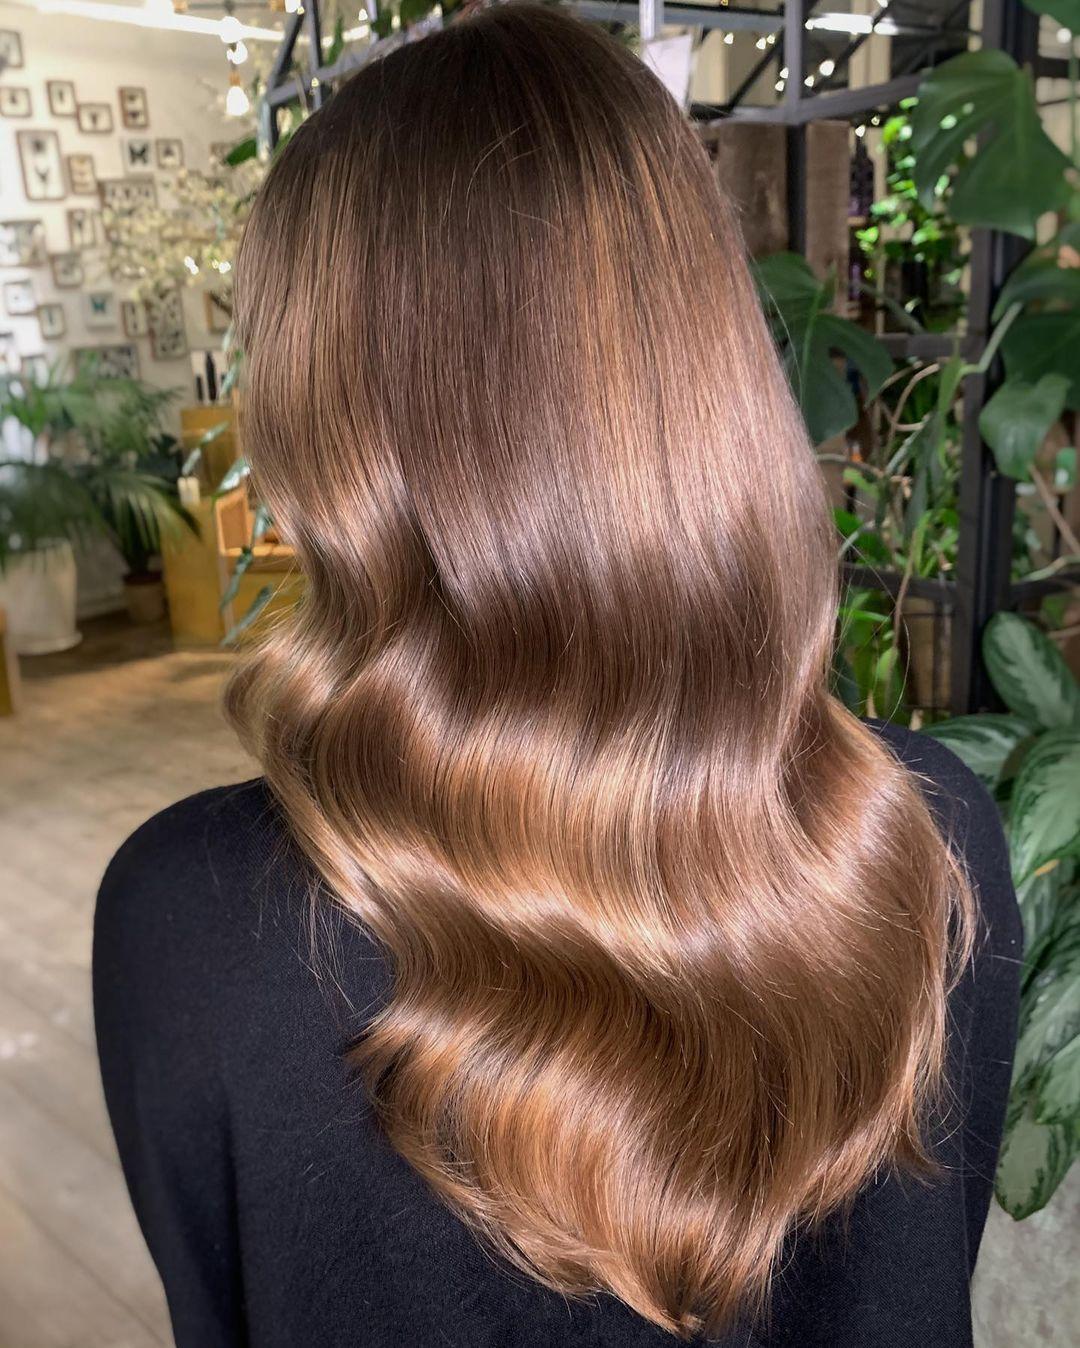 Glossy Light Golden Brown Waves